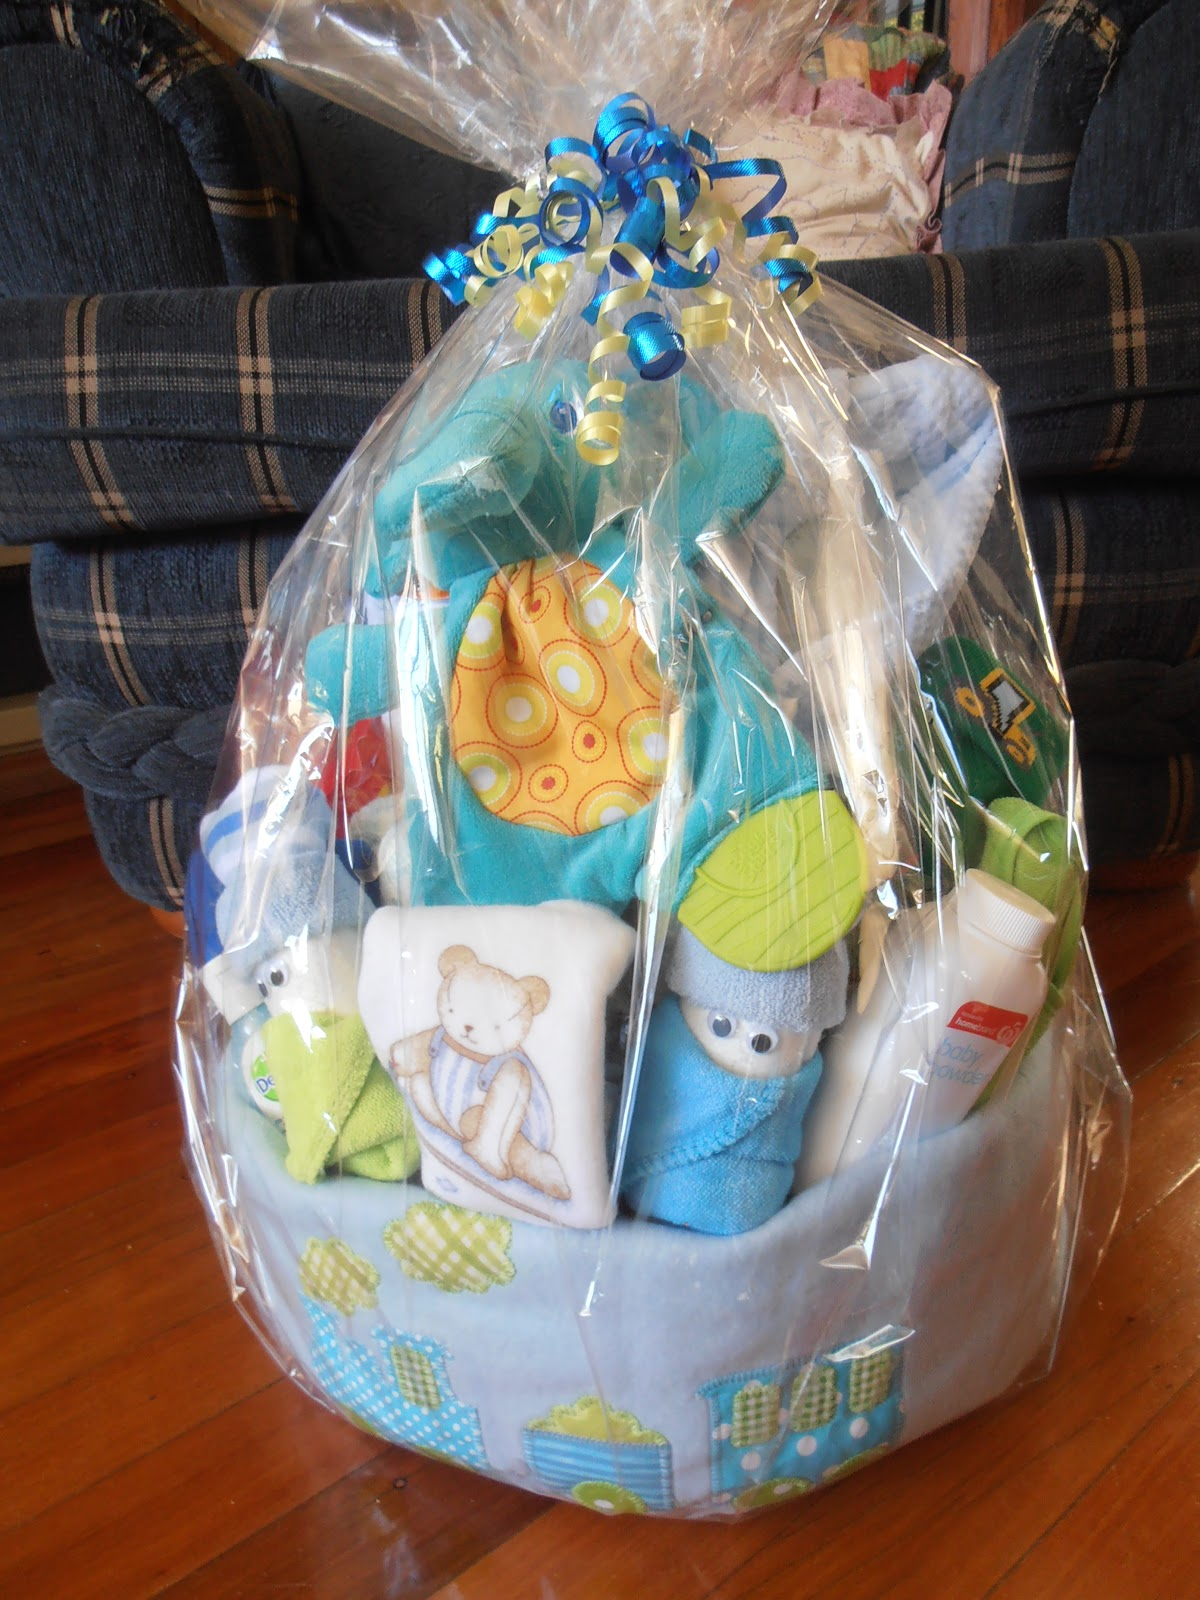 Crafty Friends: Baby Gift Ideas